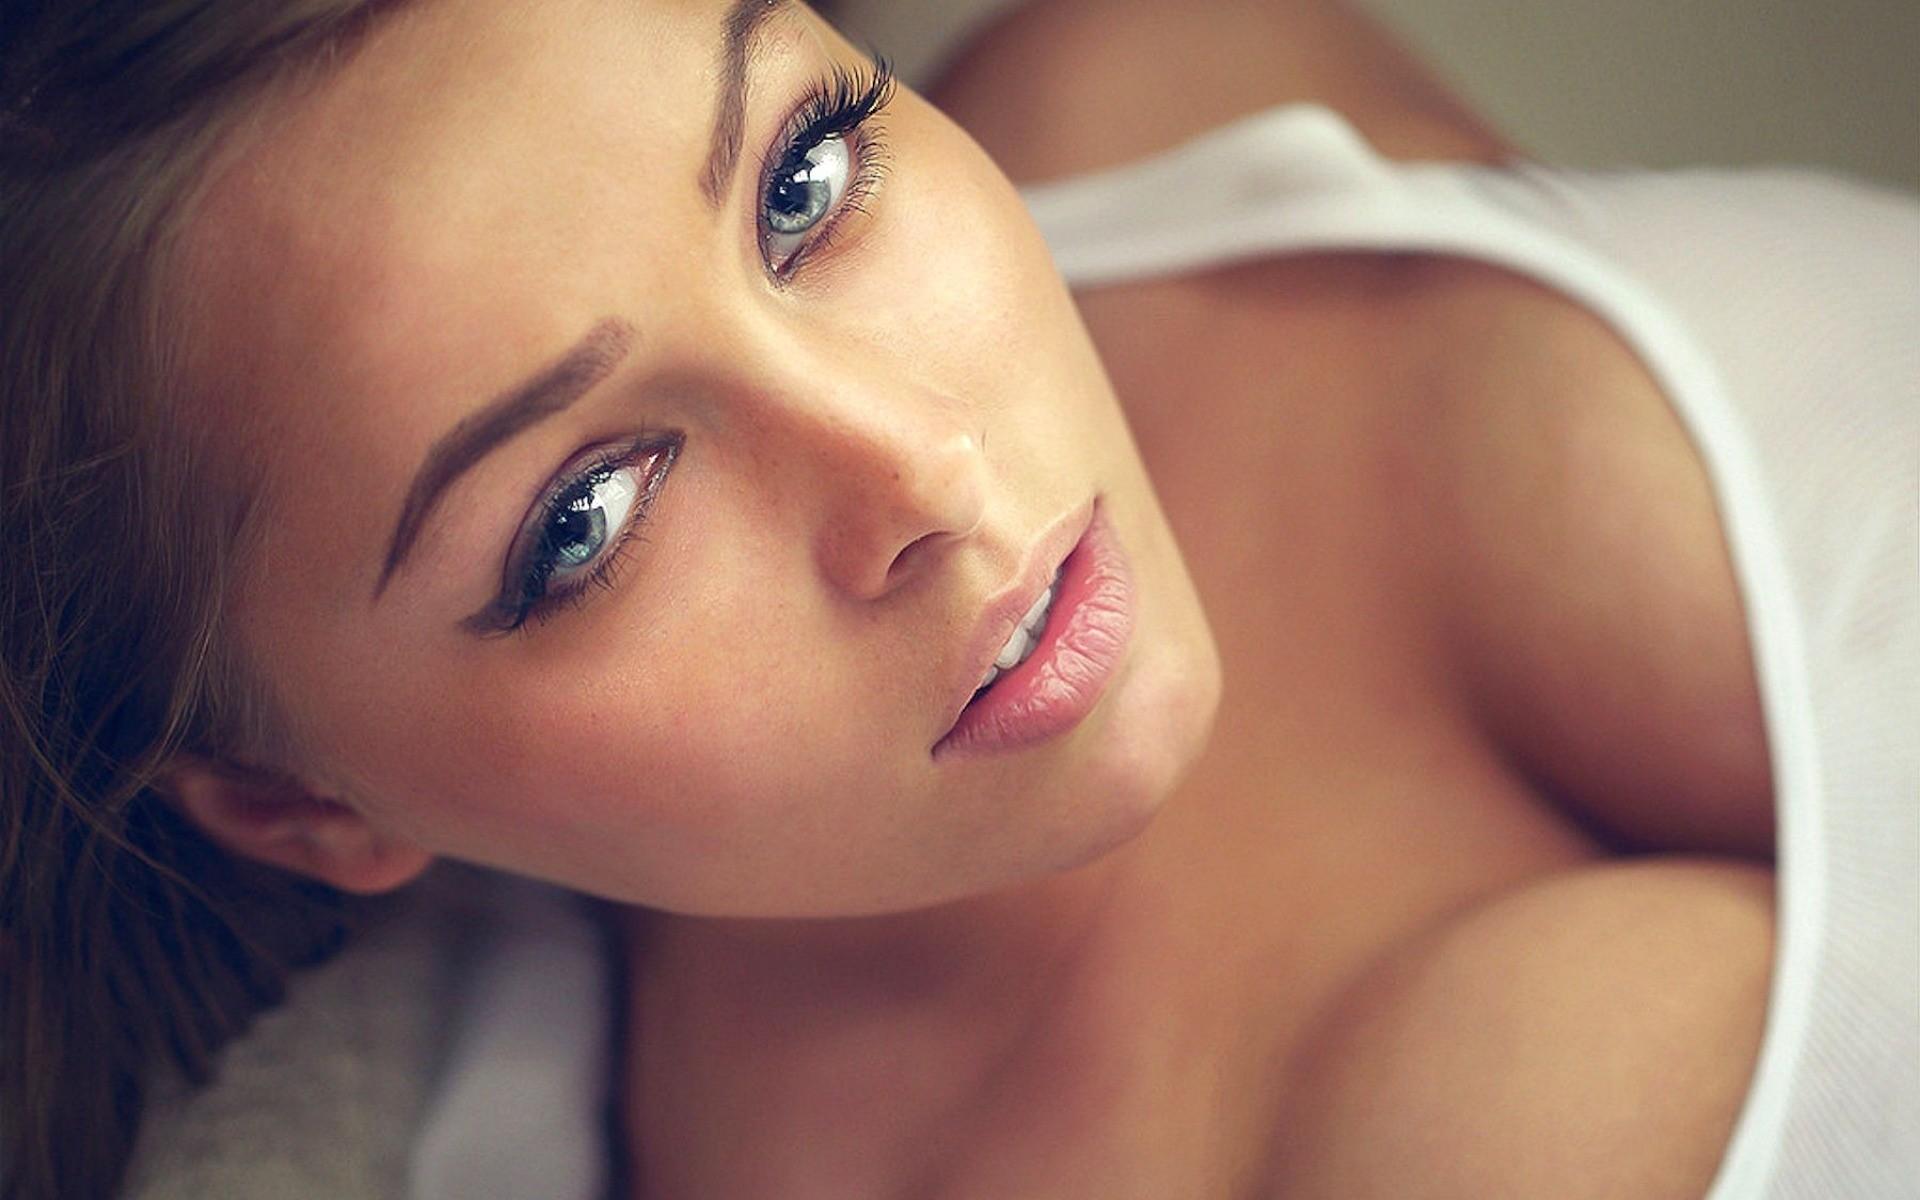 Images de seins sexy